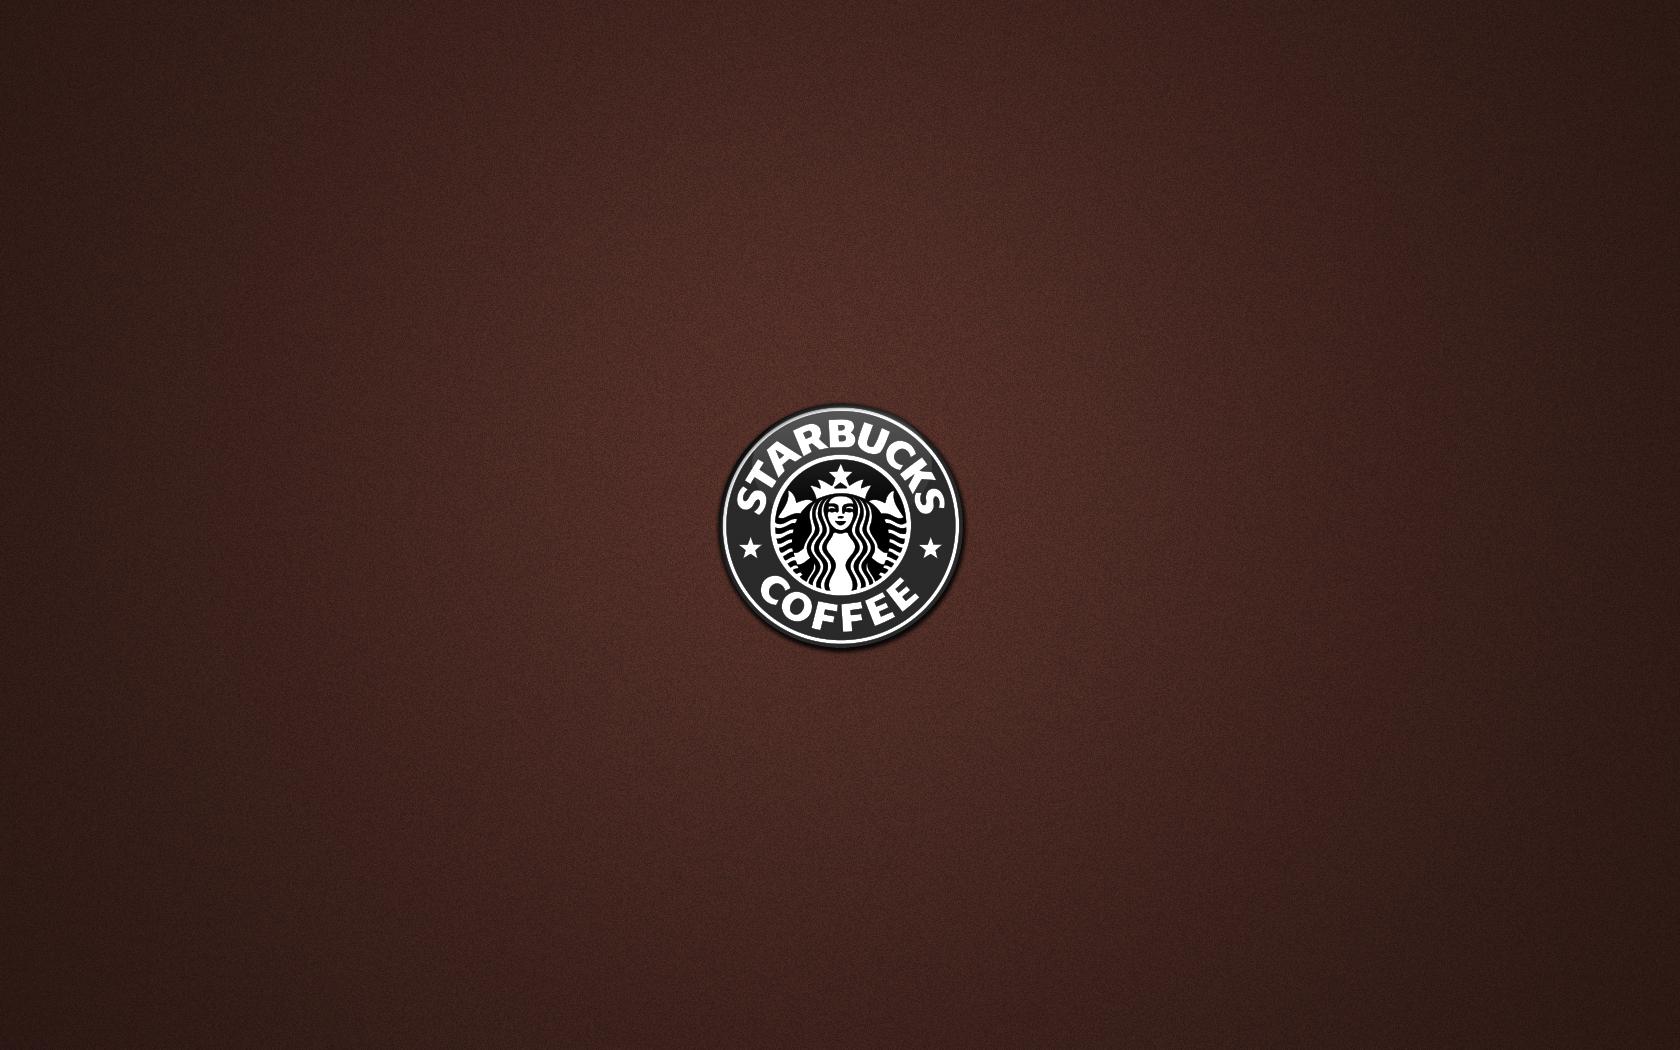 Starbucks Dark Background wallpapers